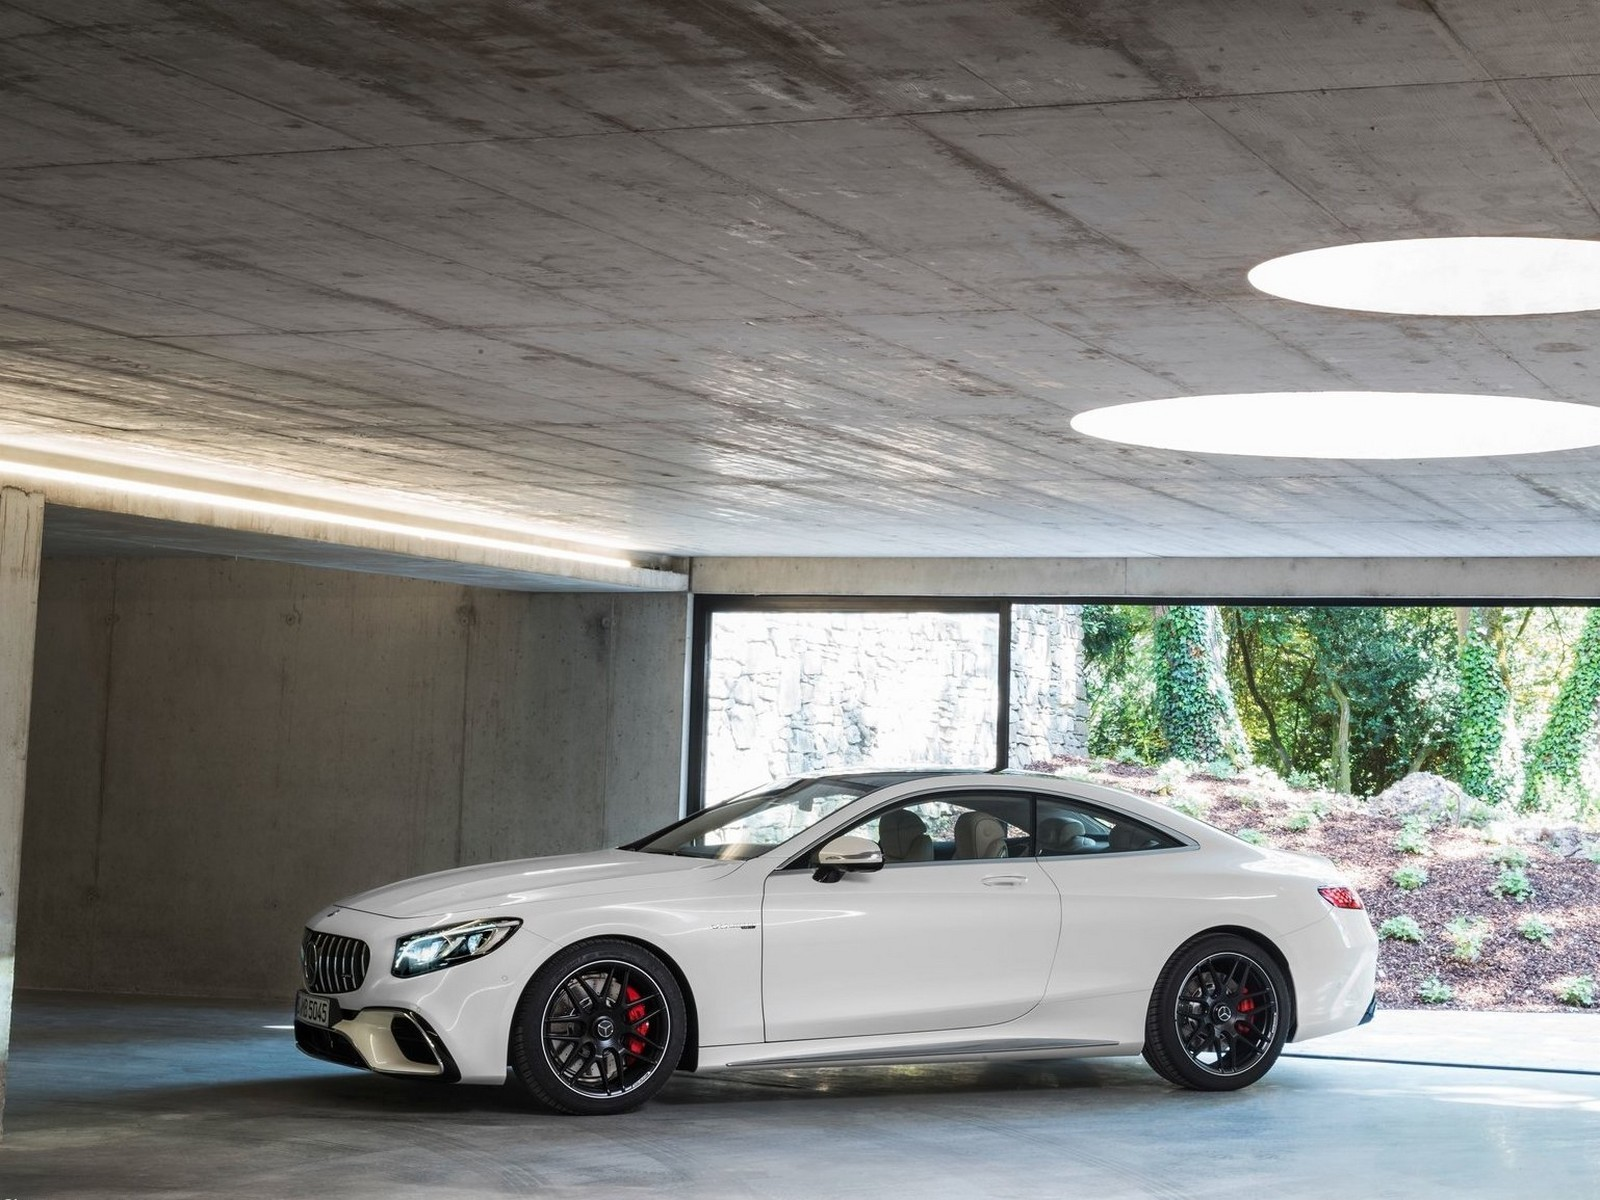 Mercedes S63 AMG Coupe 2018 - PhotosCar